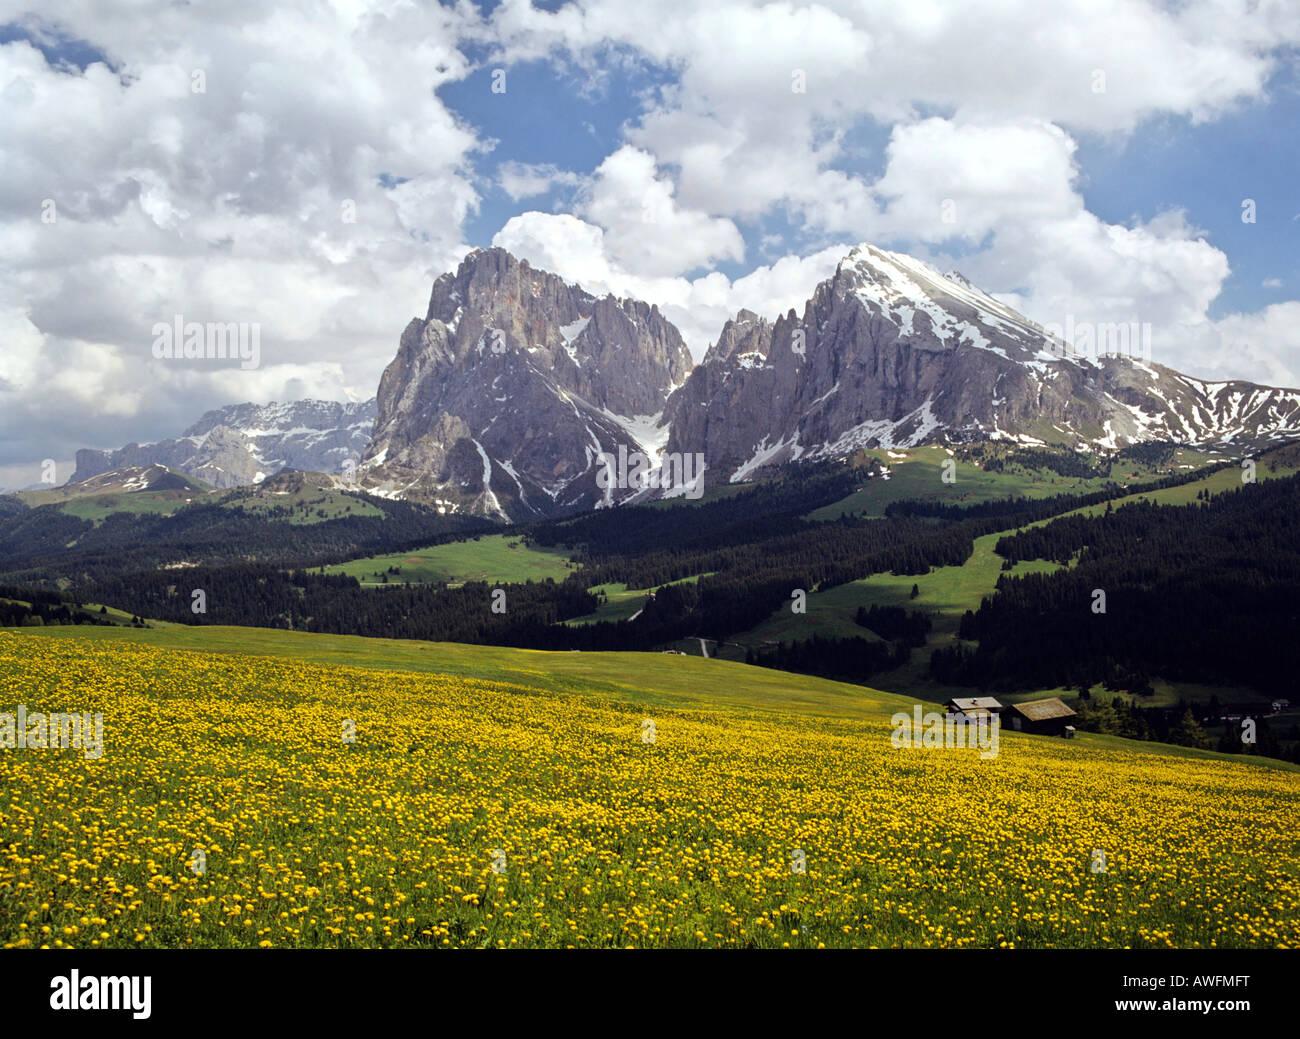 Seiser Alm alpine pasture with view of Langkofelgruppe Range, Dolomites, South Tirol, Italy, Europe - Stock Image